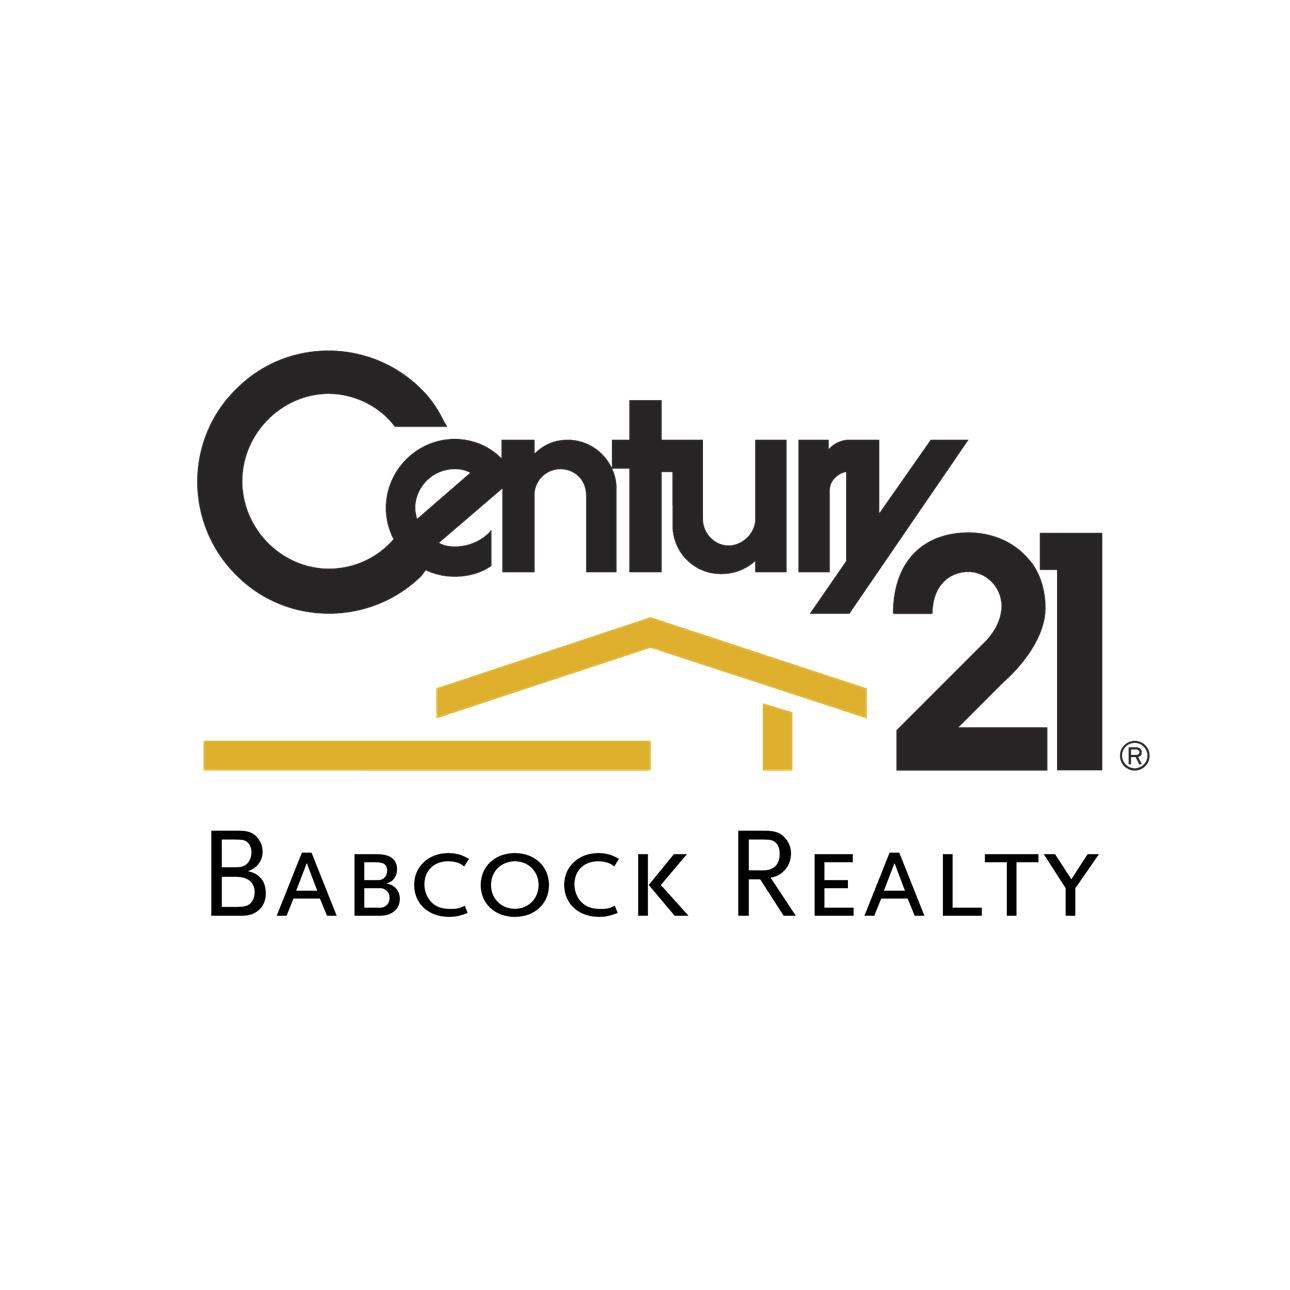 Century 21 Babcock Realty